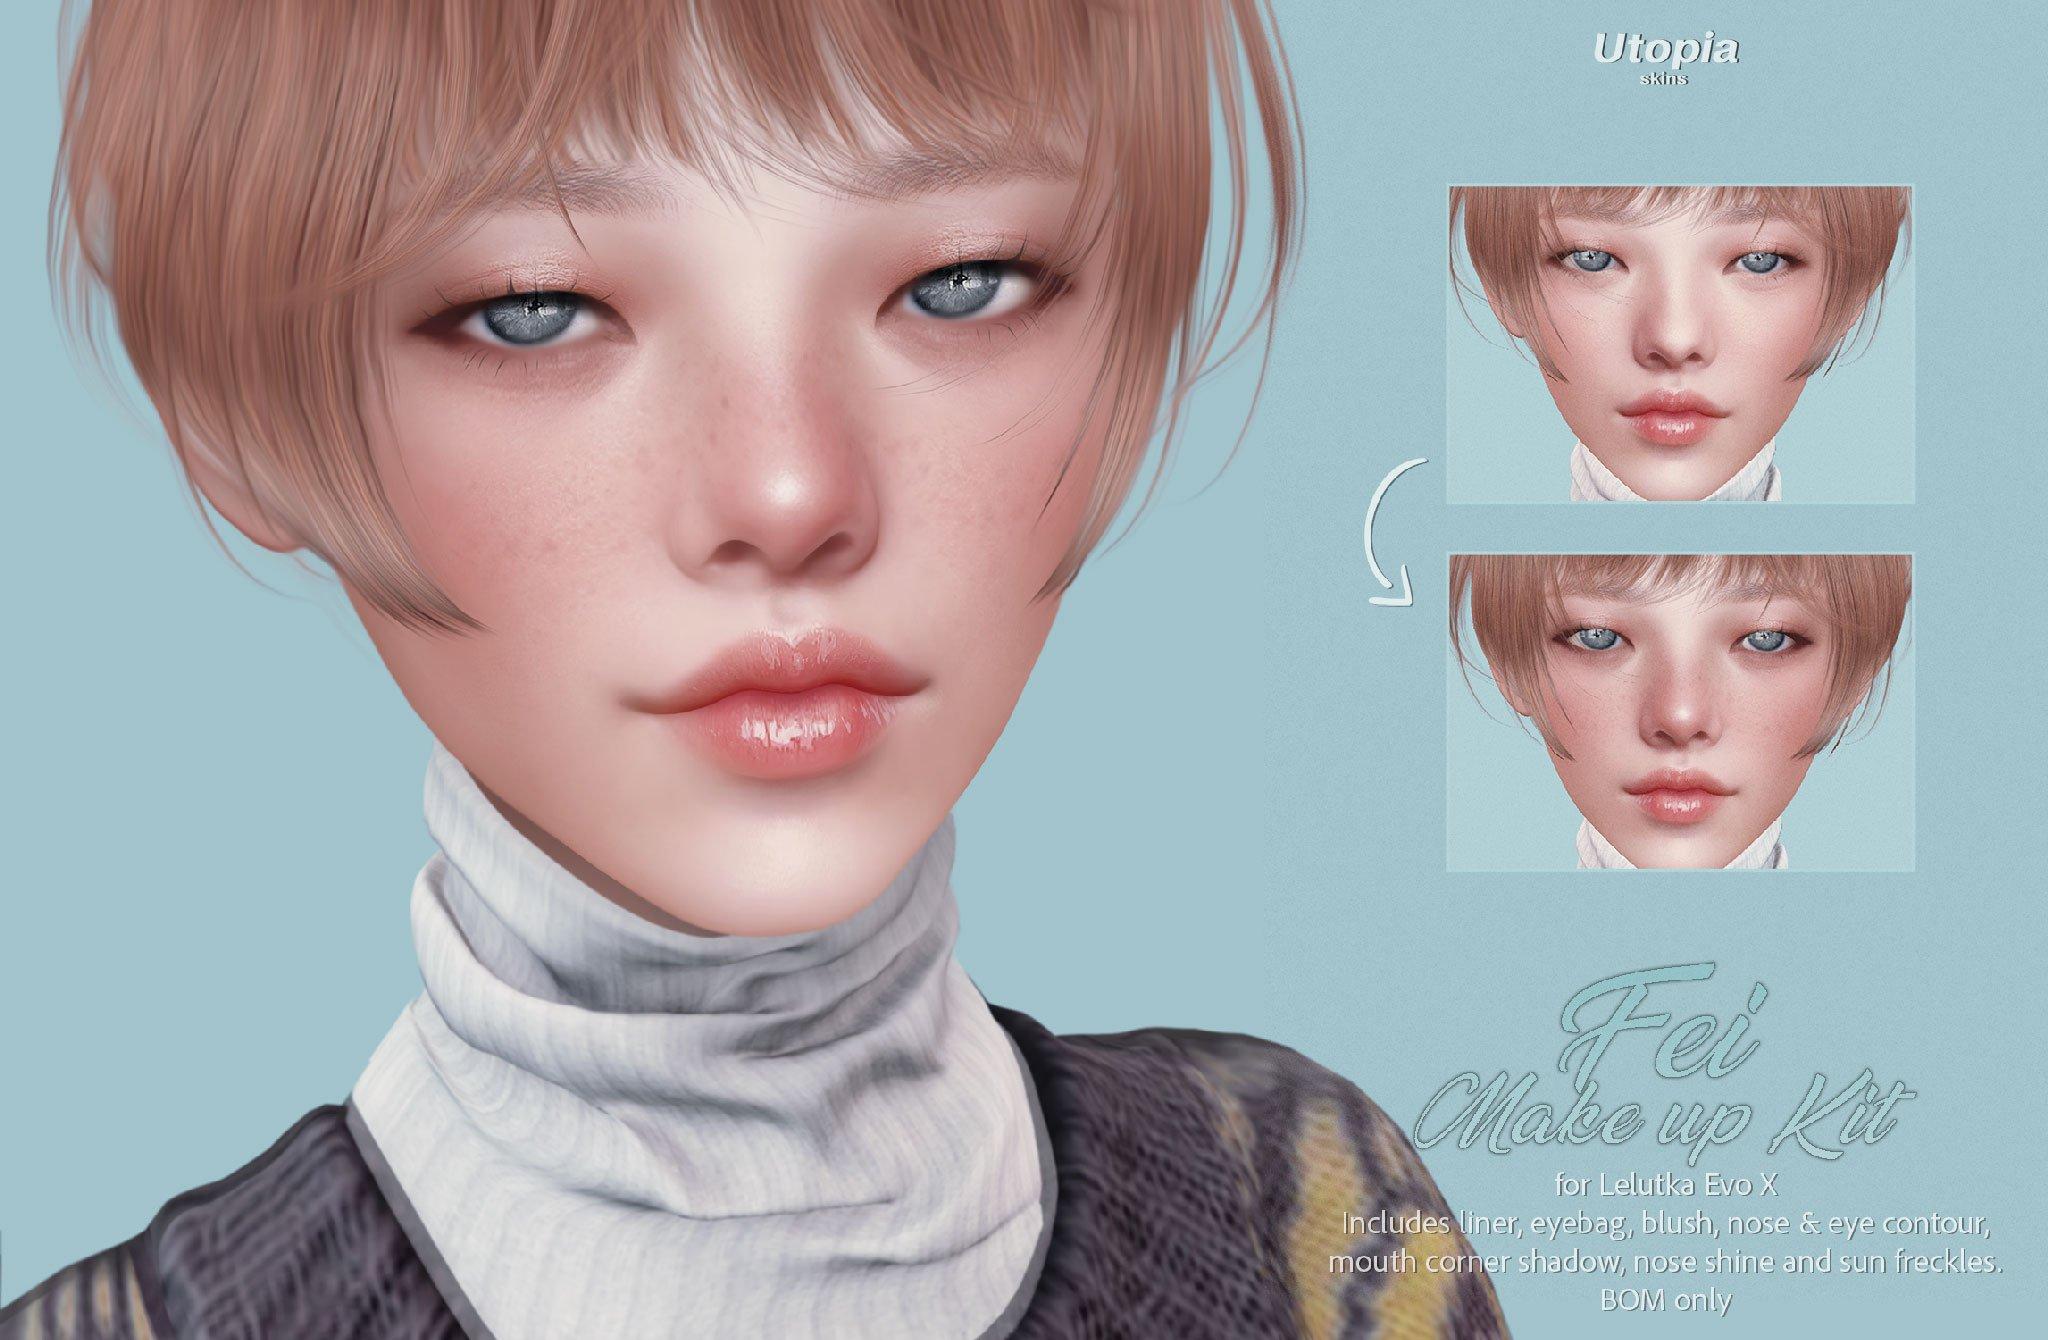 Utopia Skins